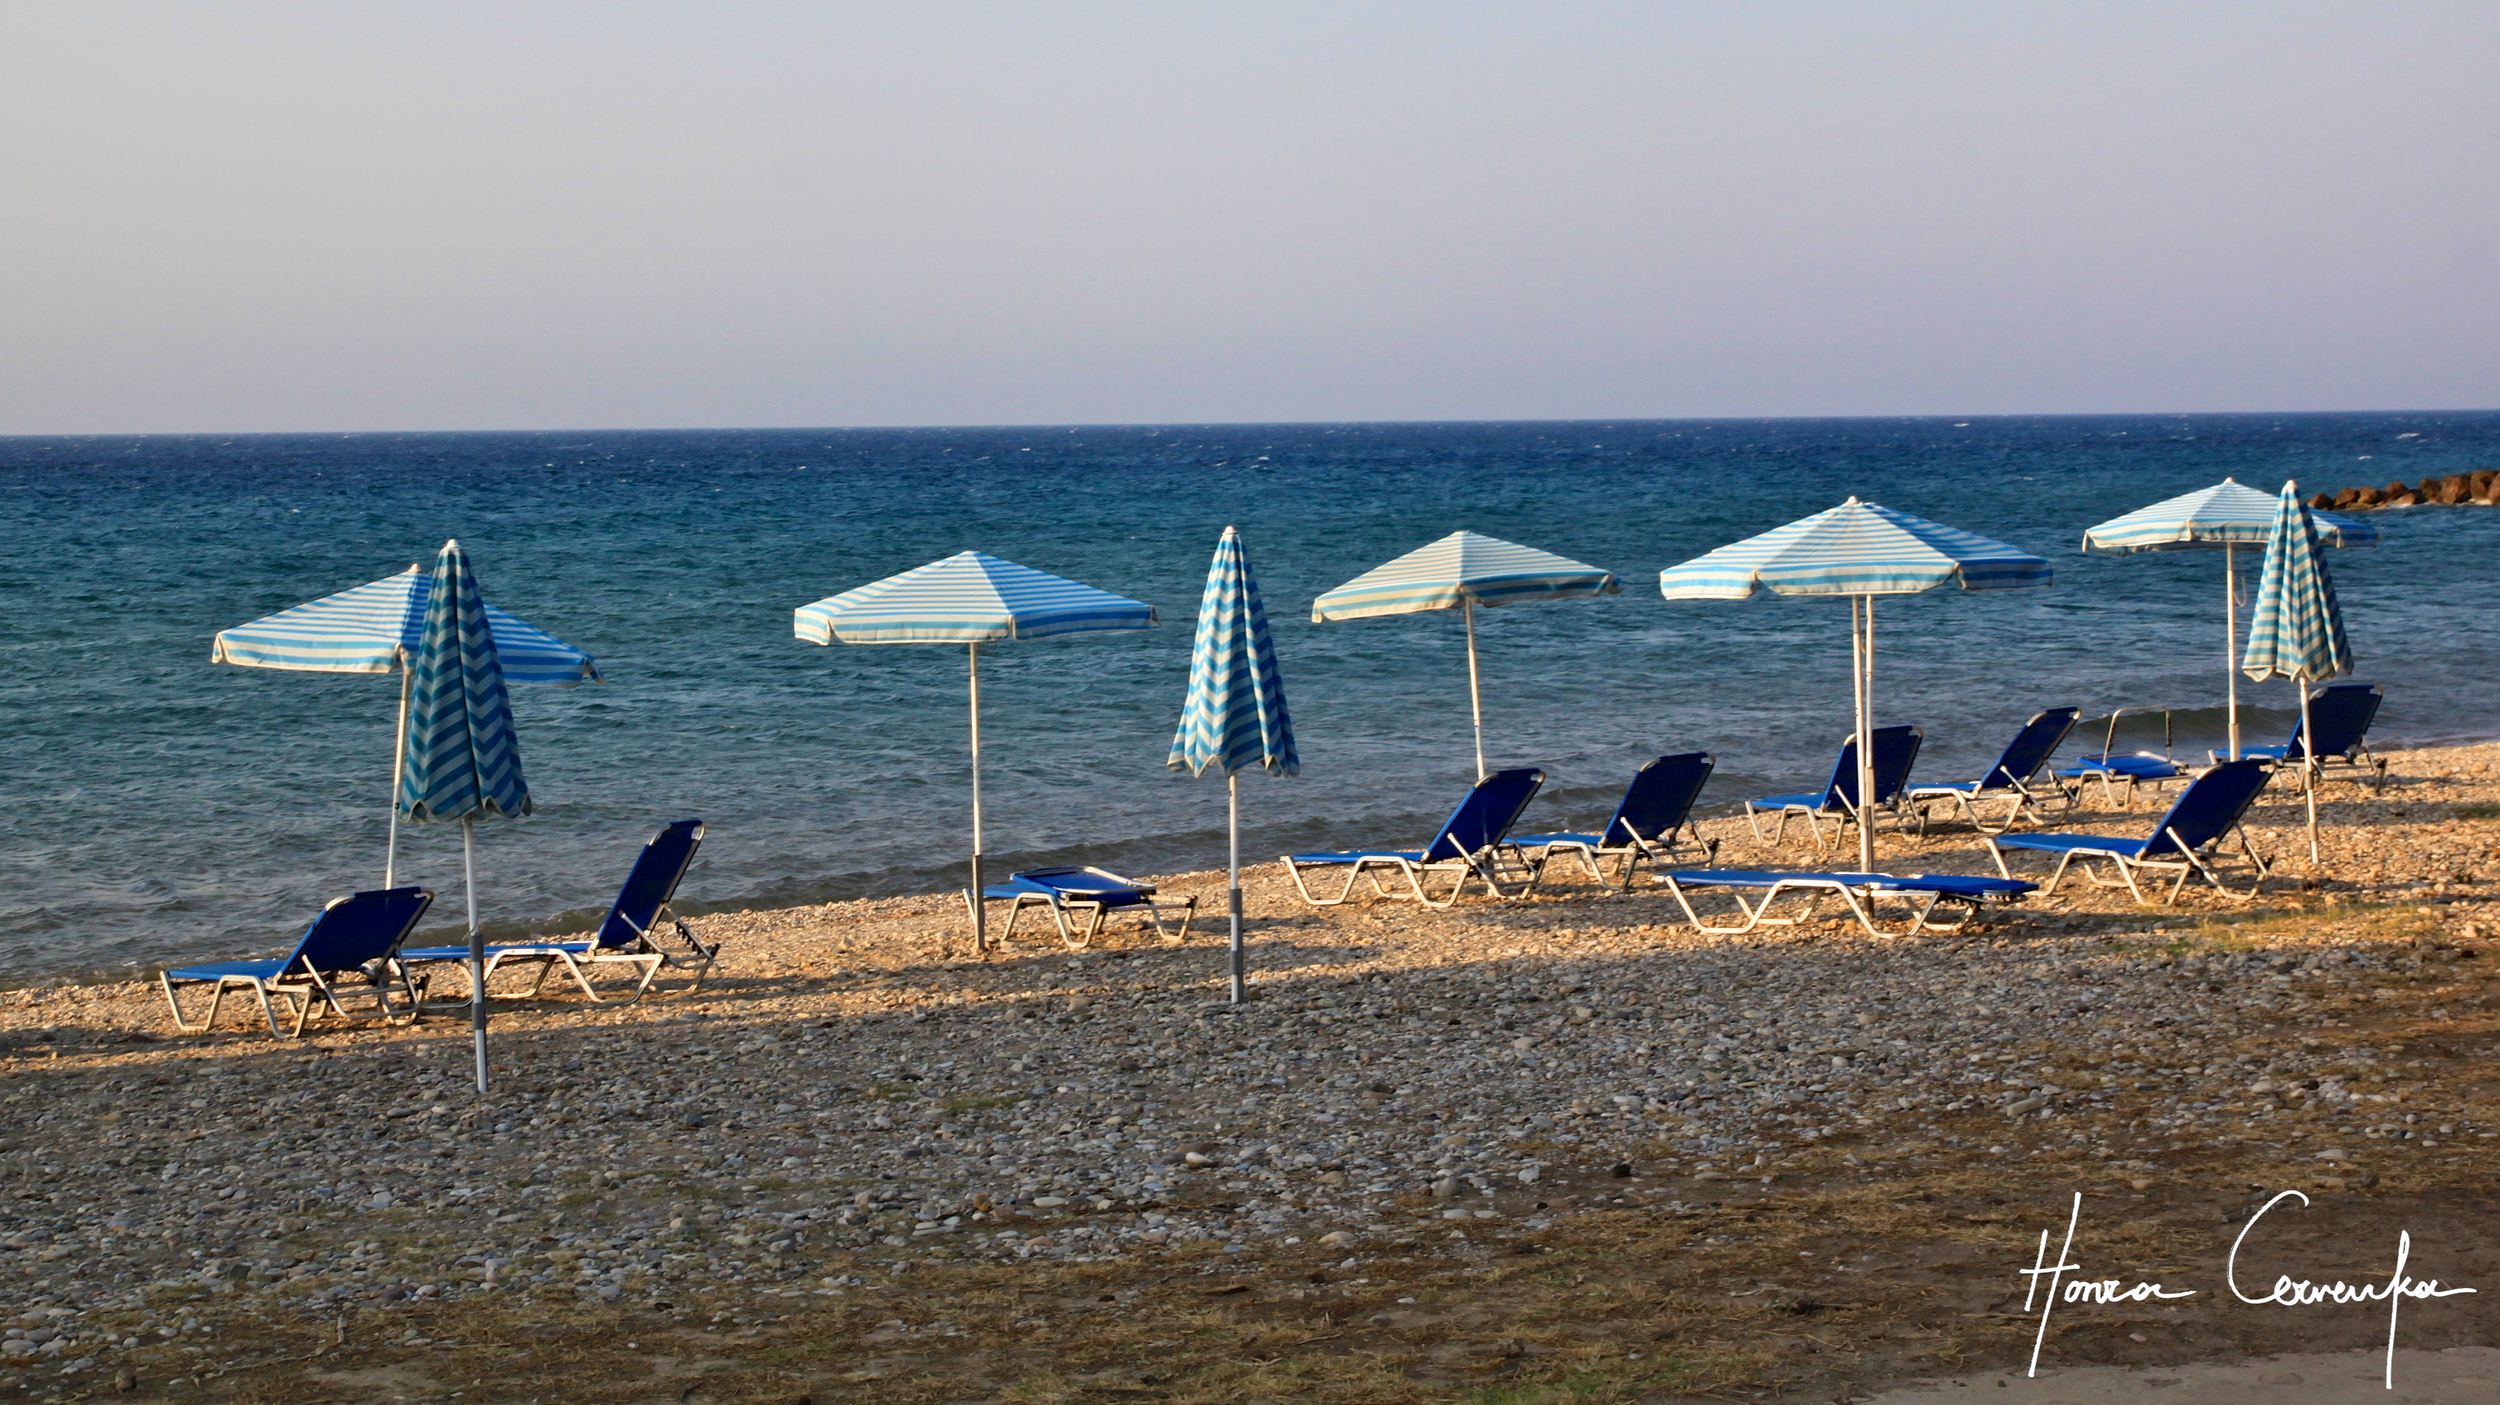 Karlovasi-Samos-Greece-beach-Honza-Cervenka